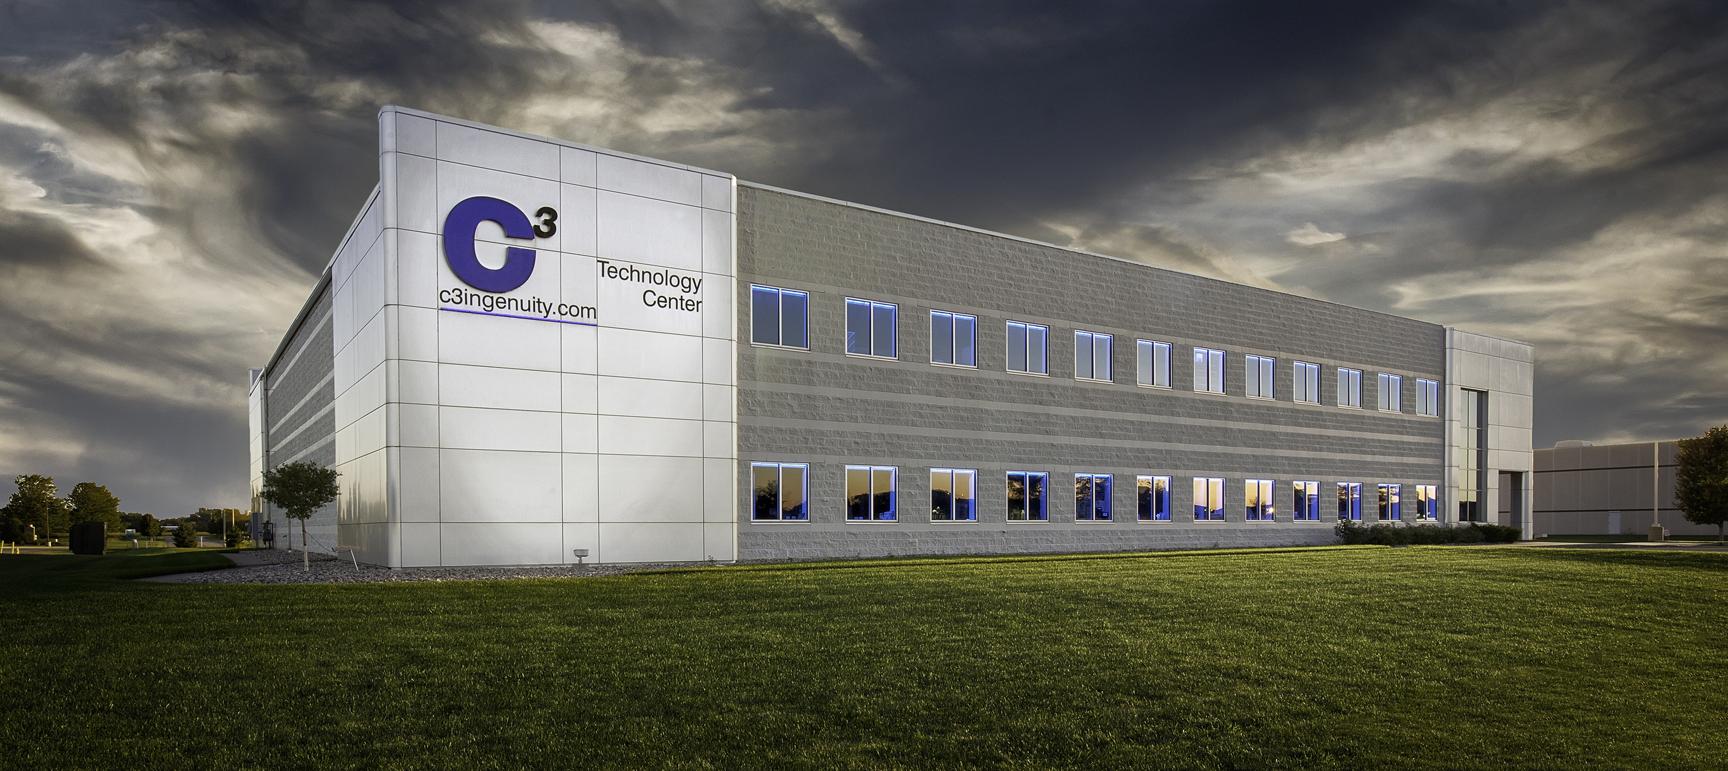 C3 rolls up success in the Fox Cities